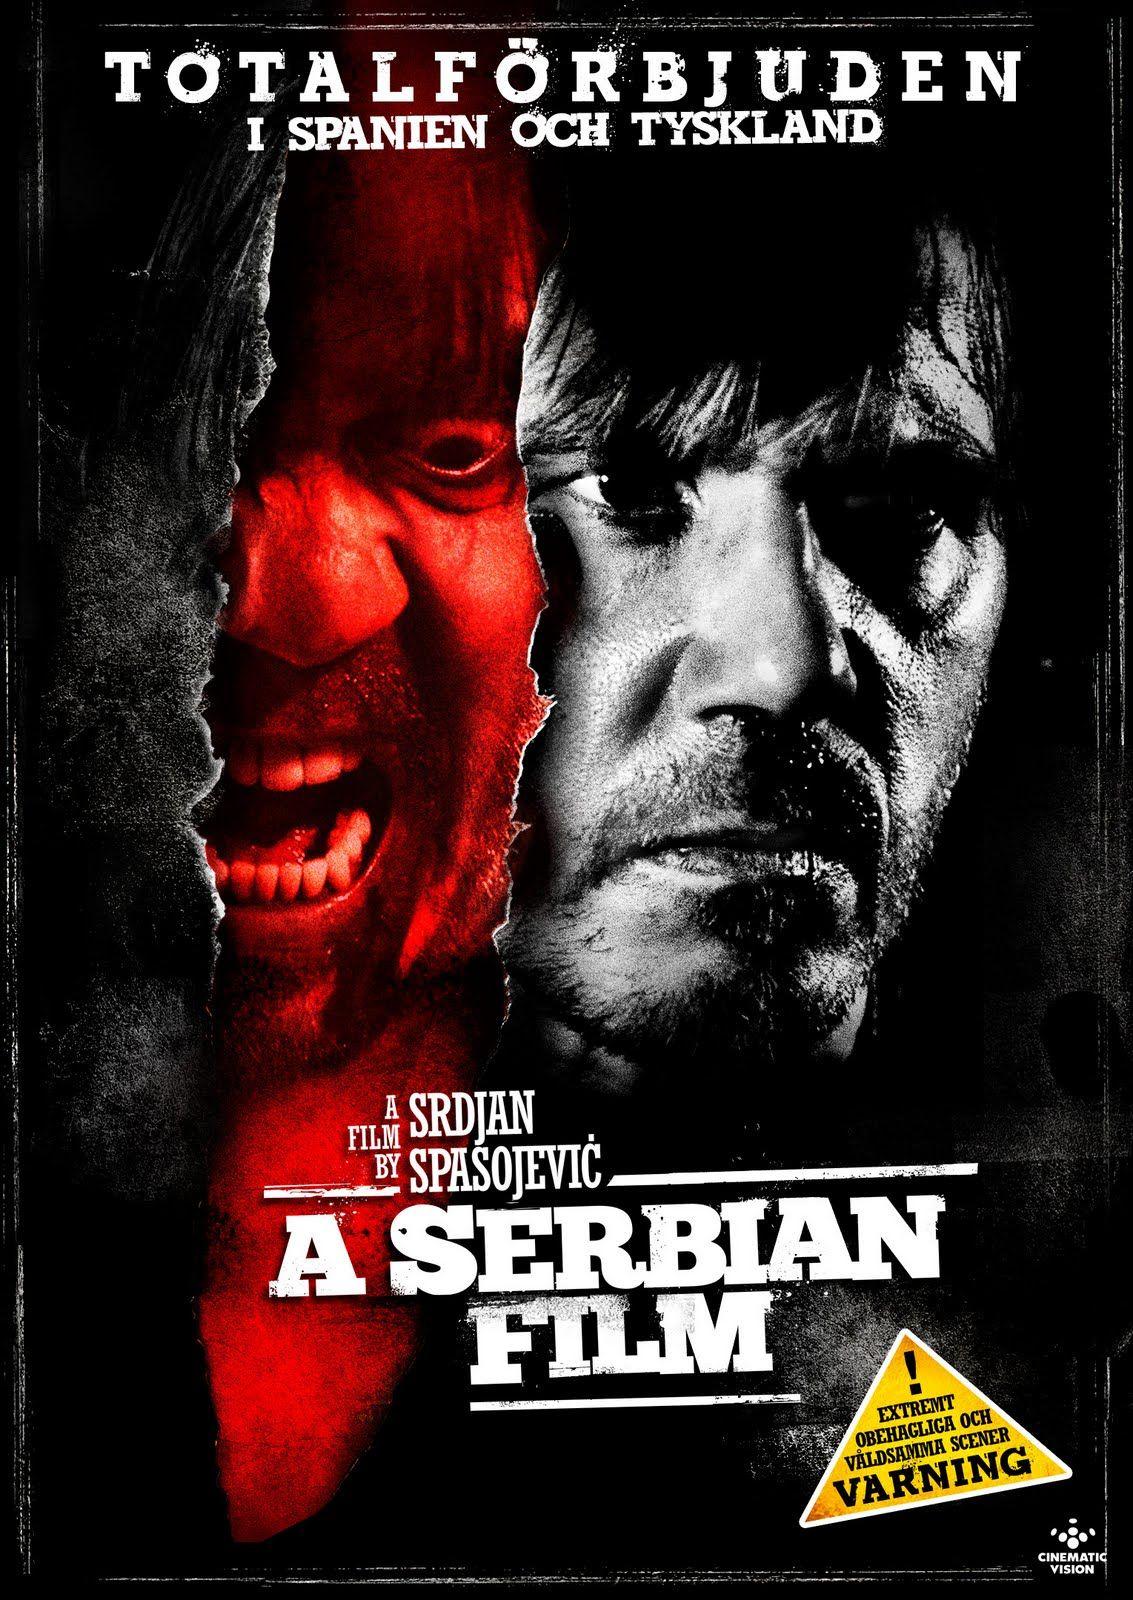 A serbian film / soundtrack / smb youtube.